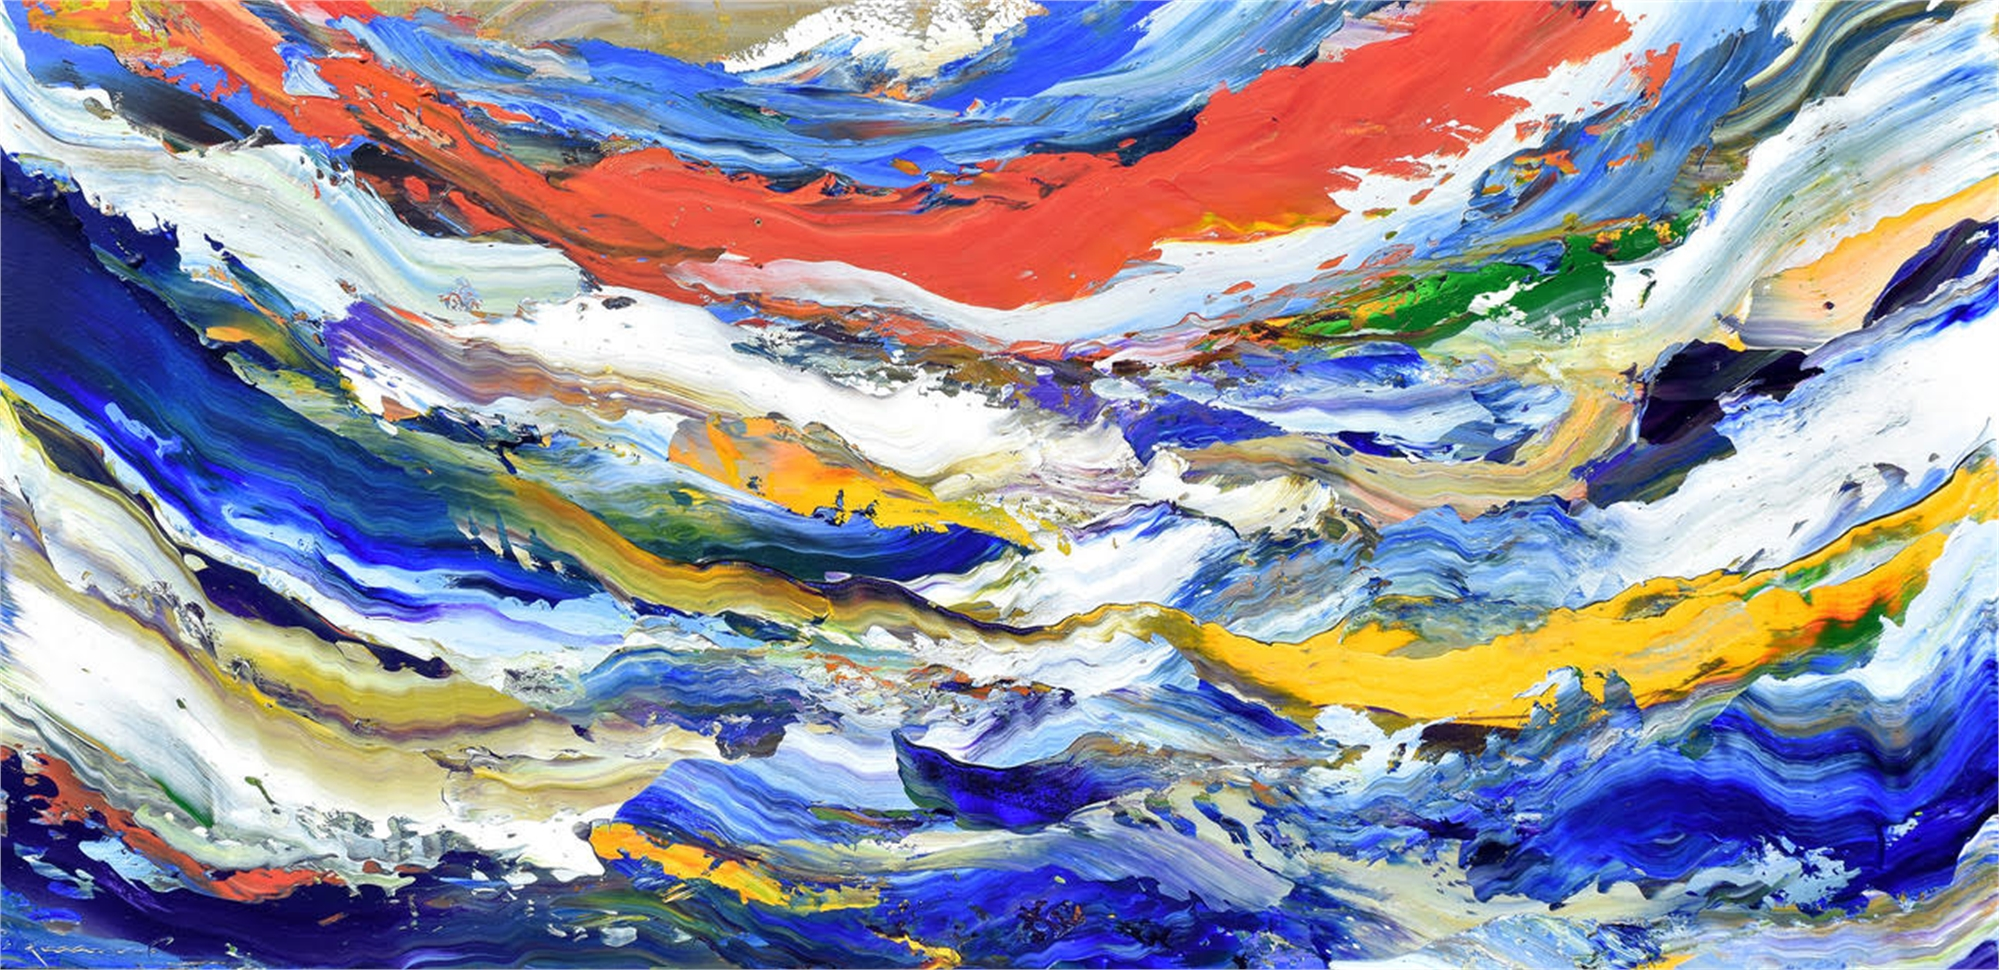 Red Sky by James C. Leonard